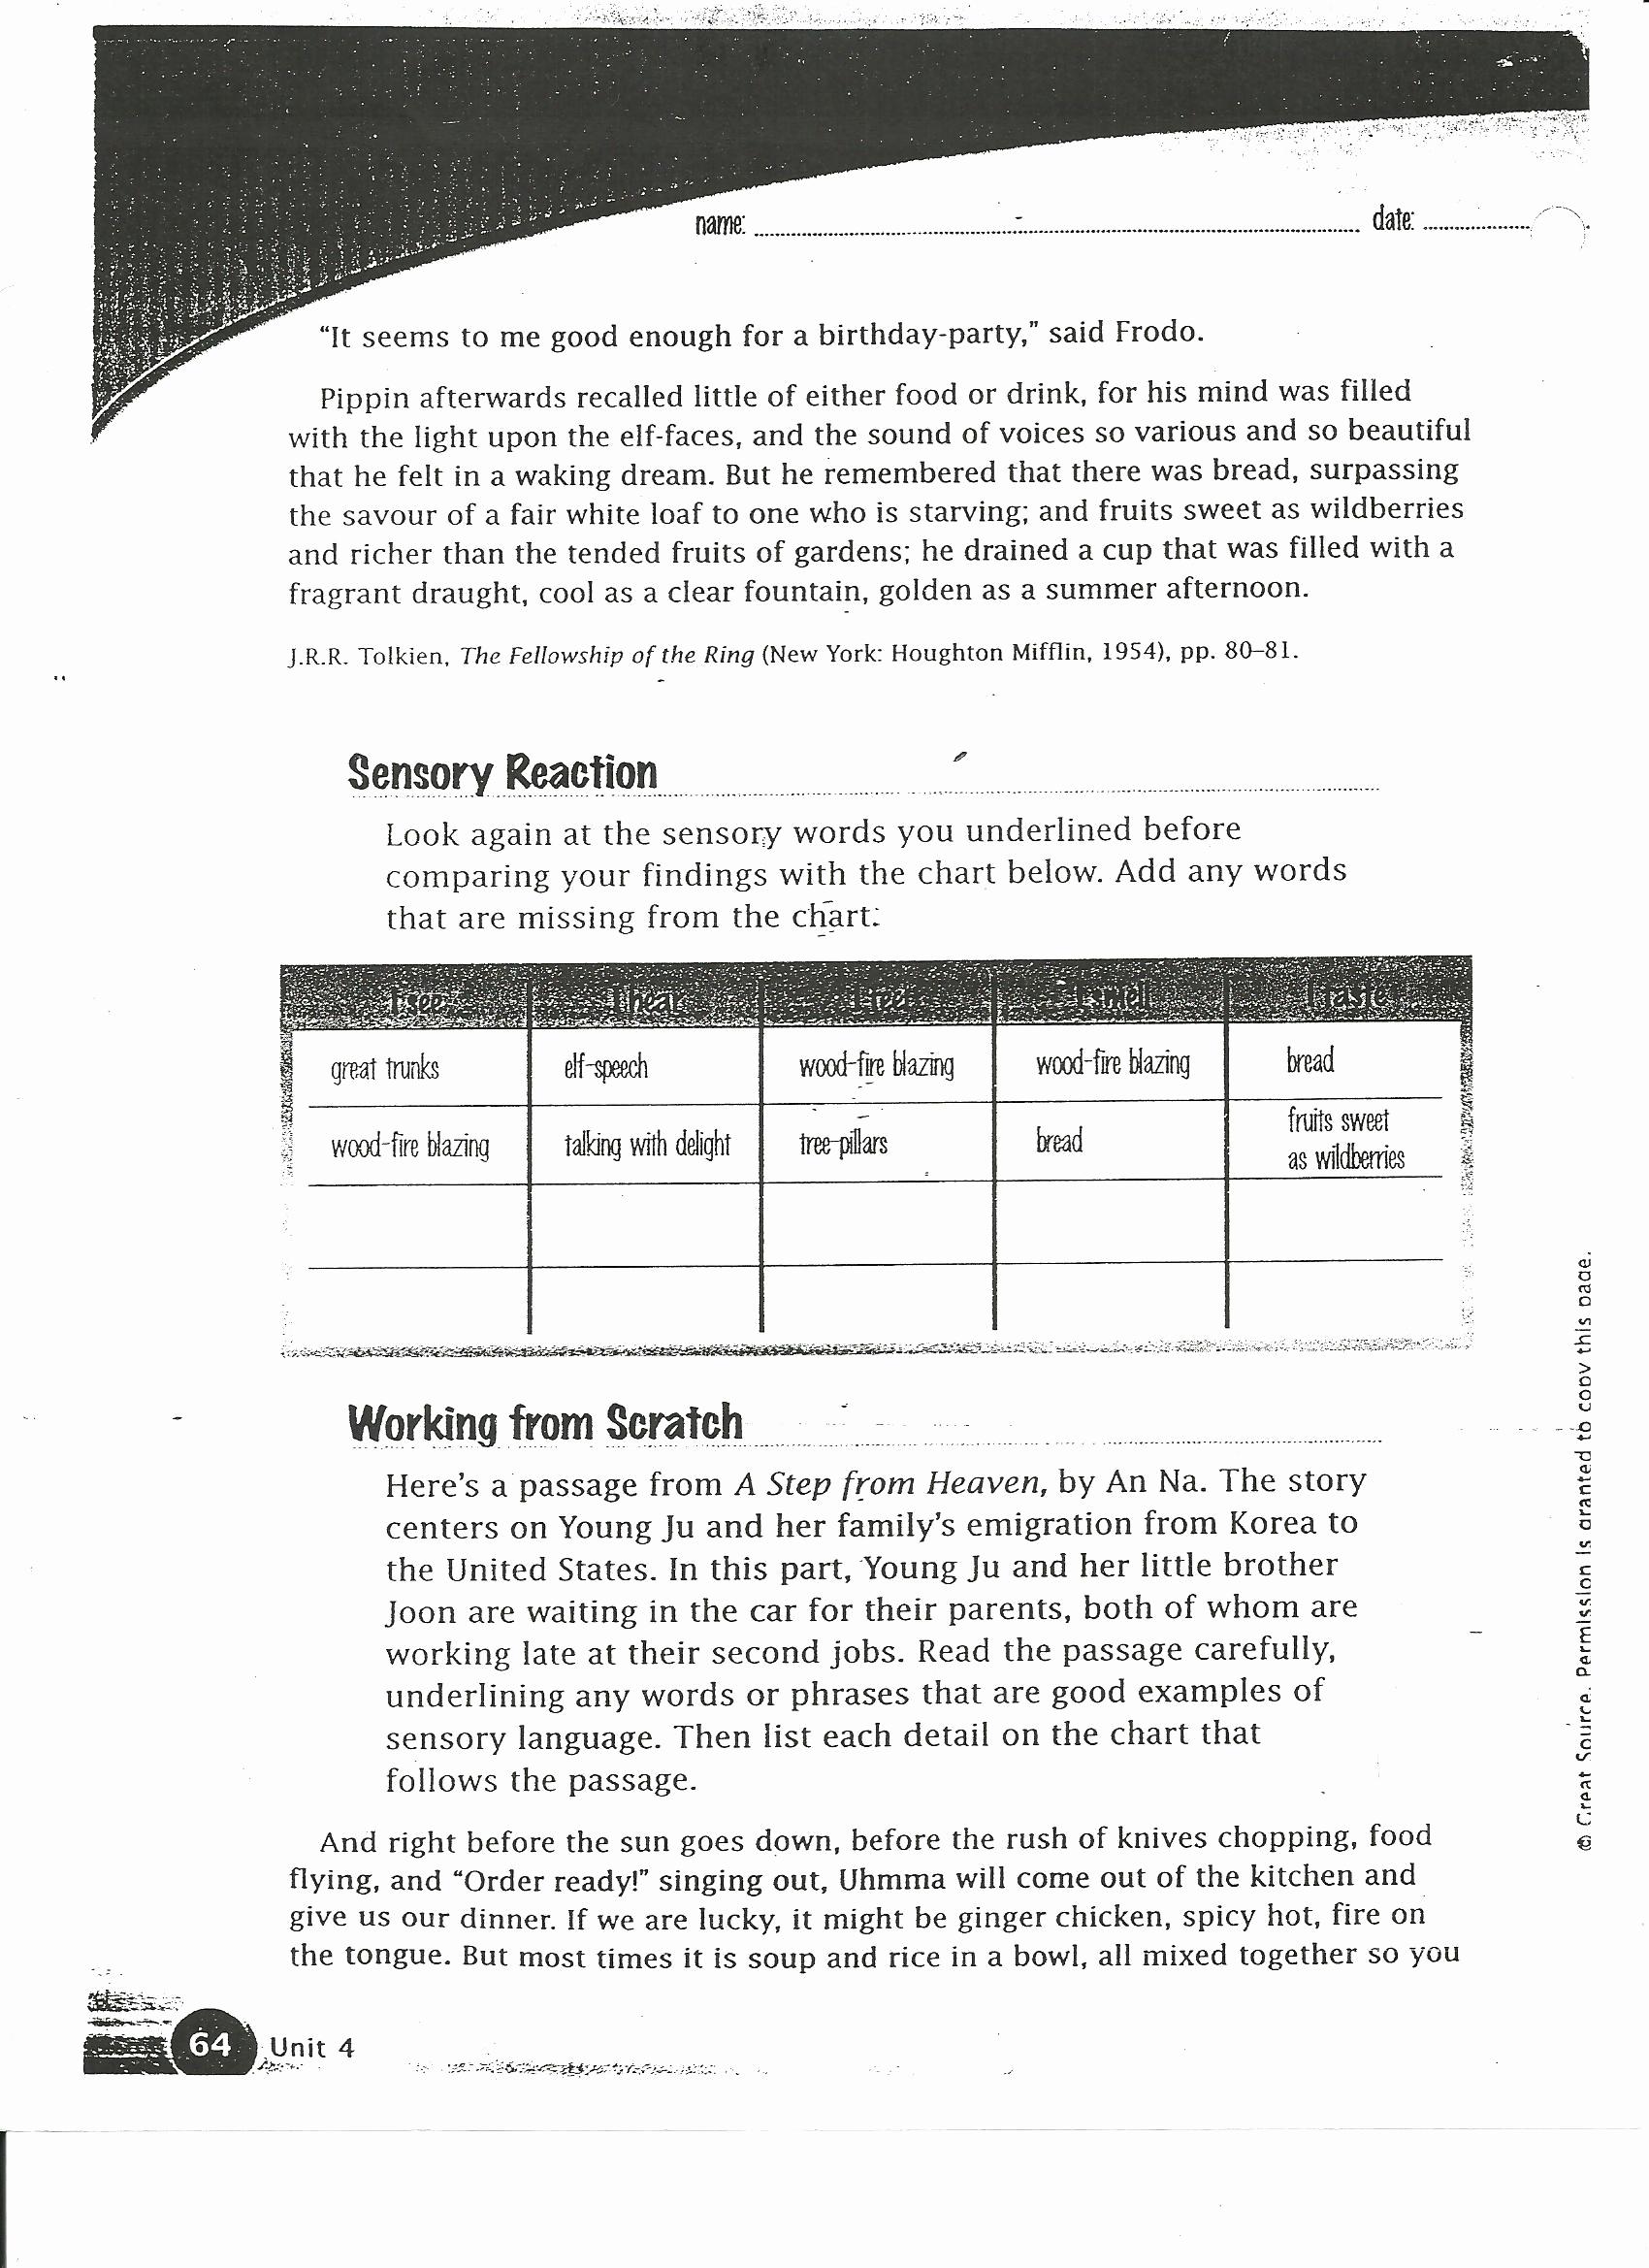 Sensory Detail Worksheet New Sensory Detail Worksheet